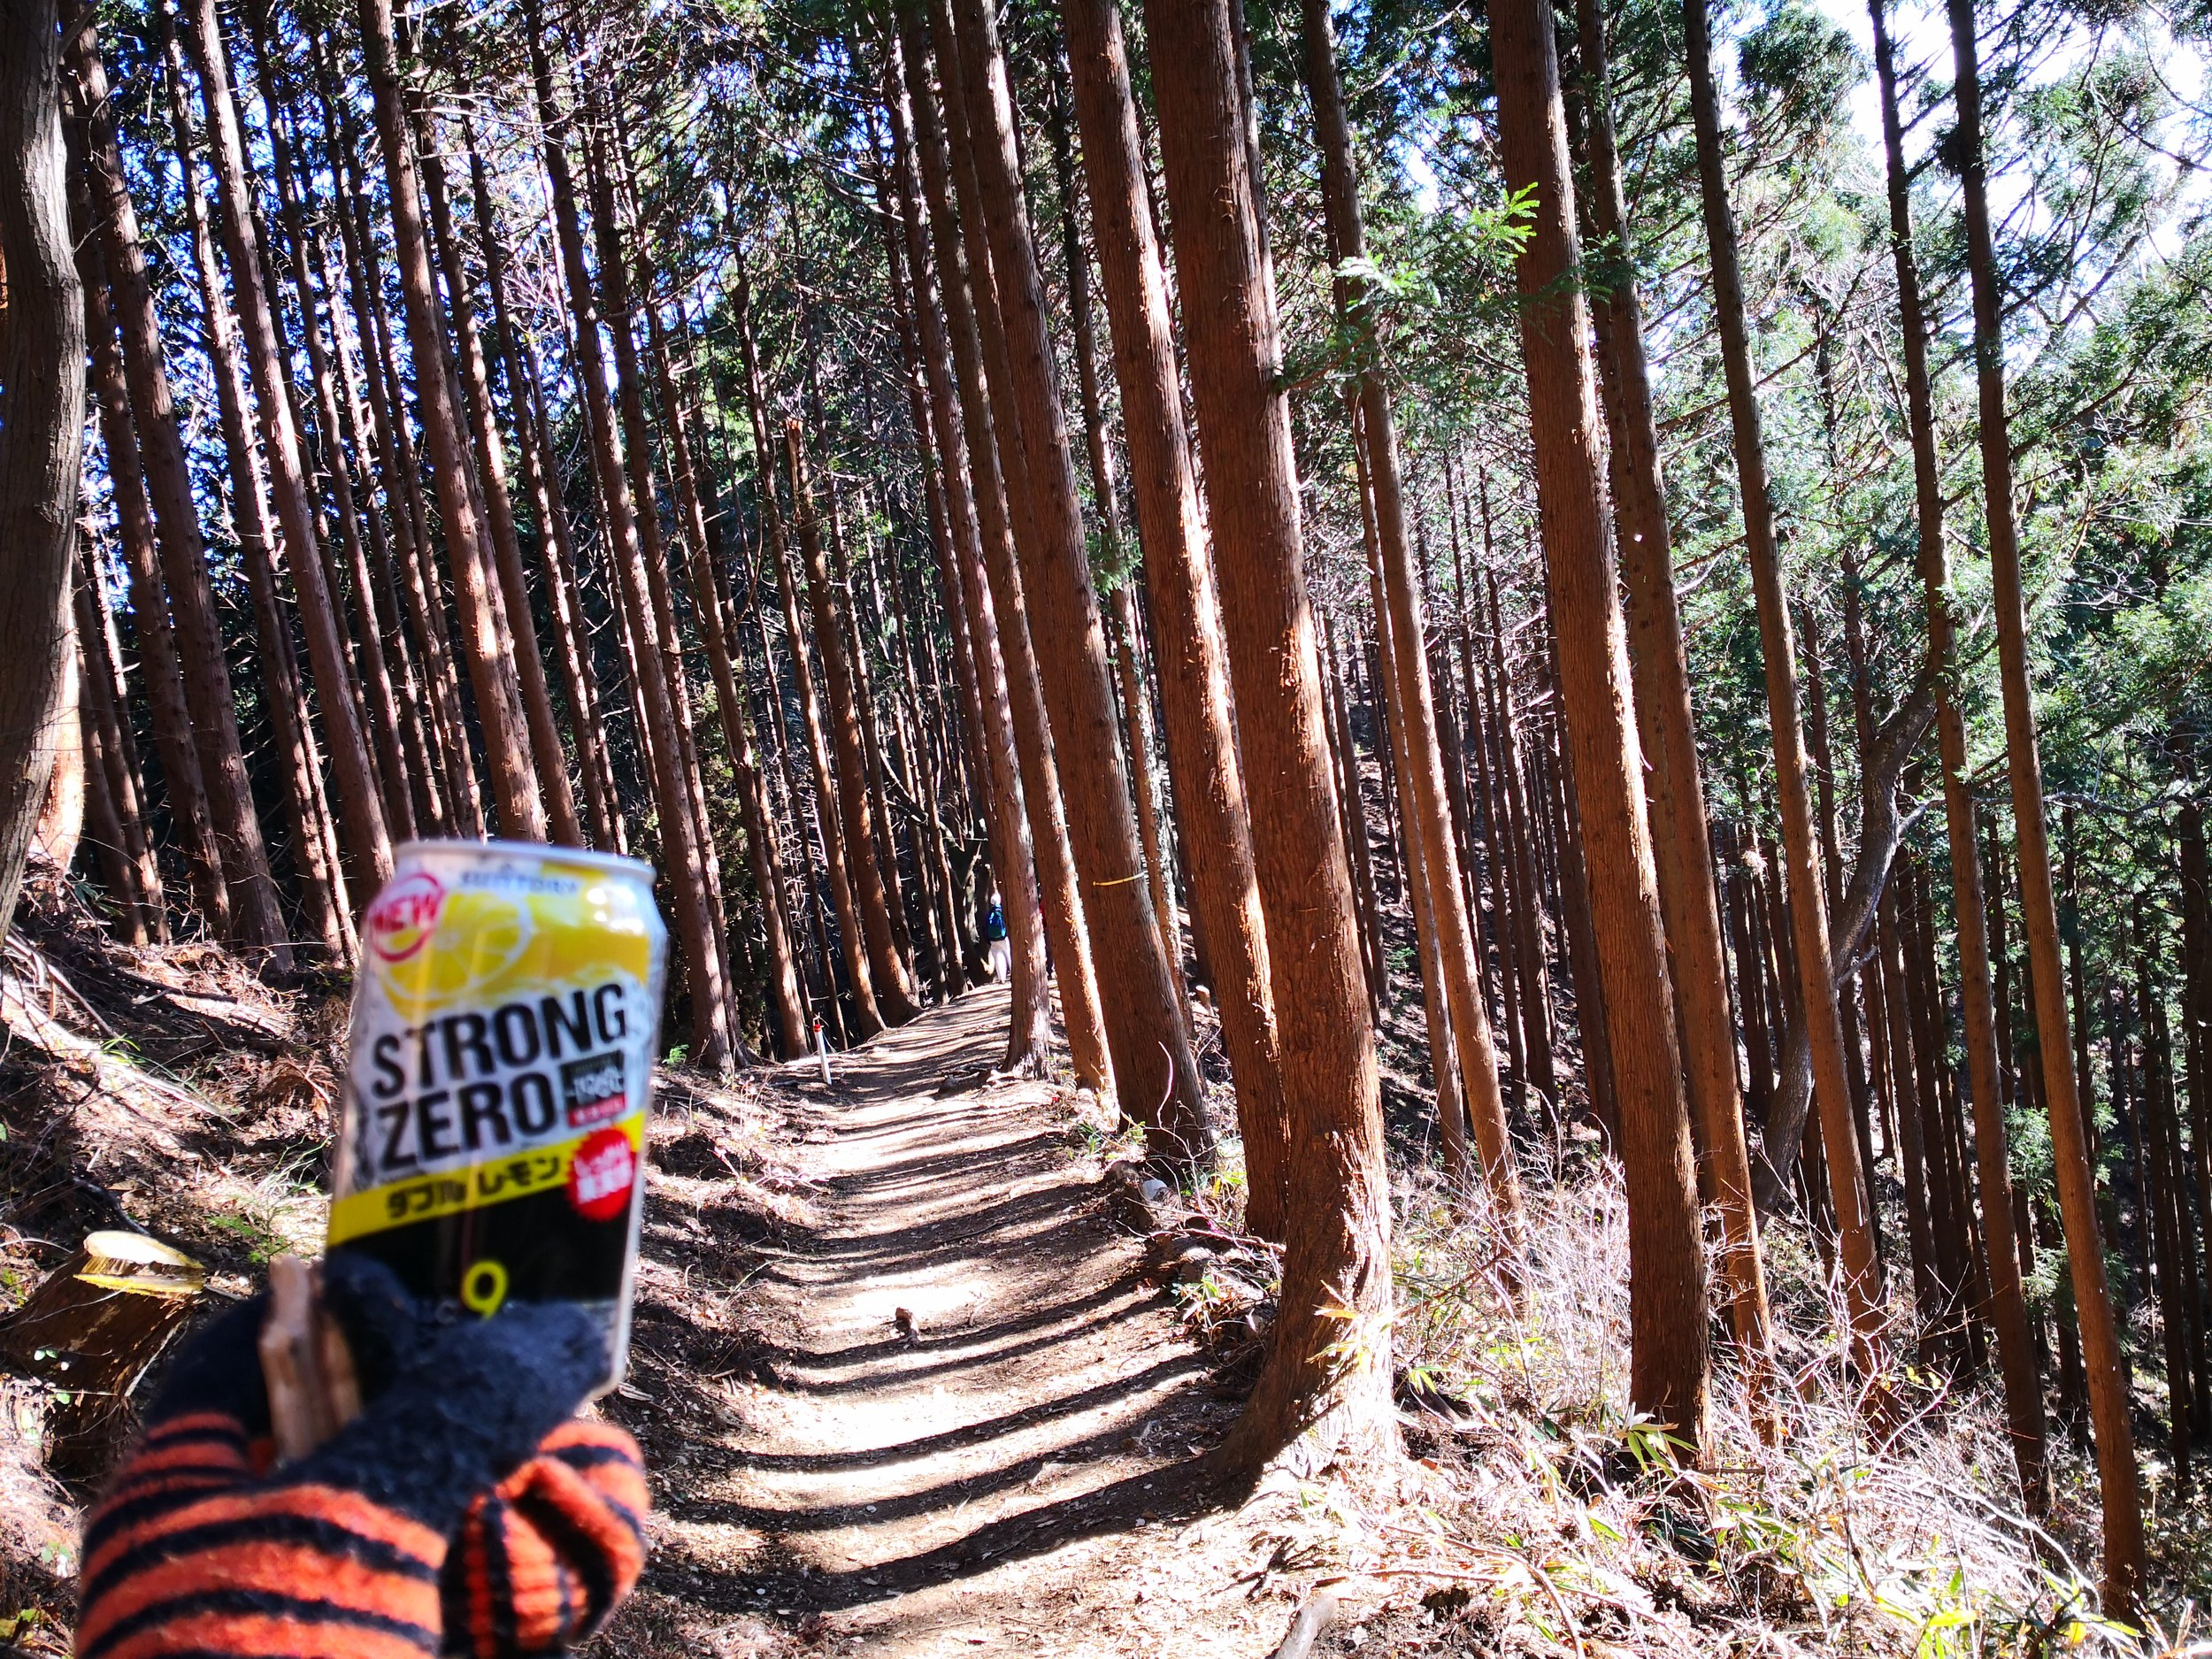 Forest chuhike (chuhai + hike)